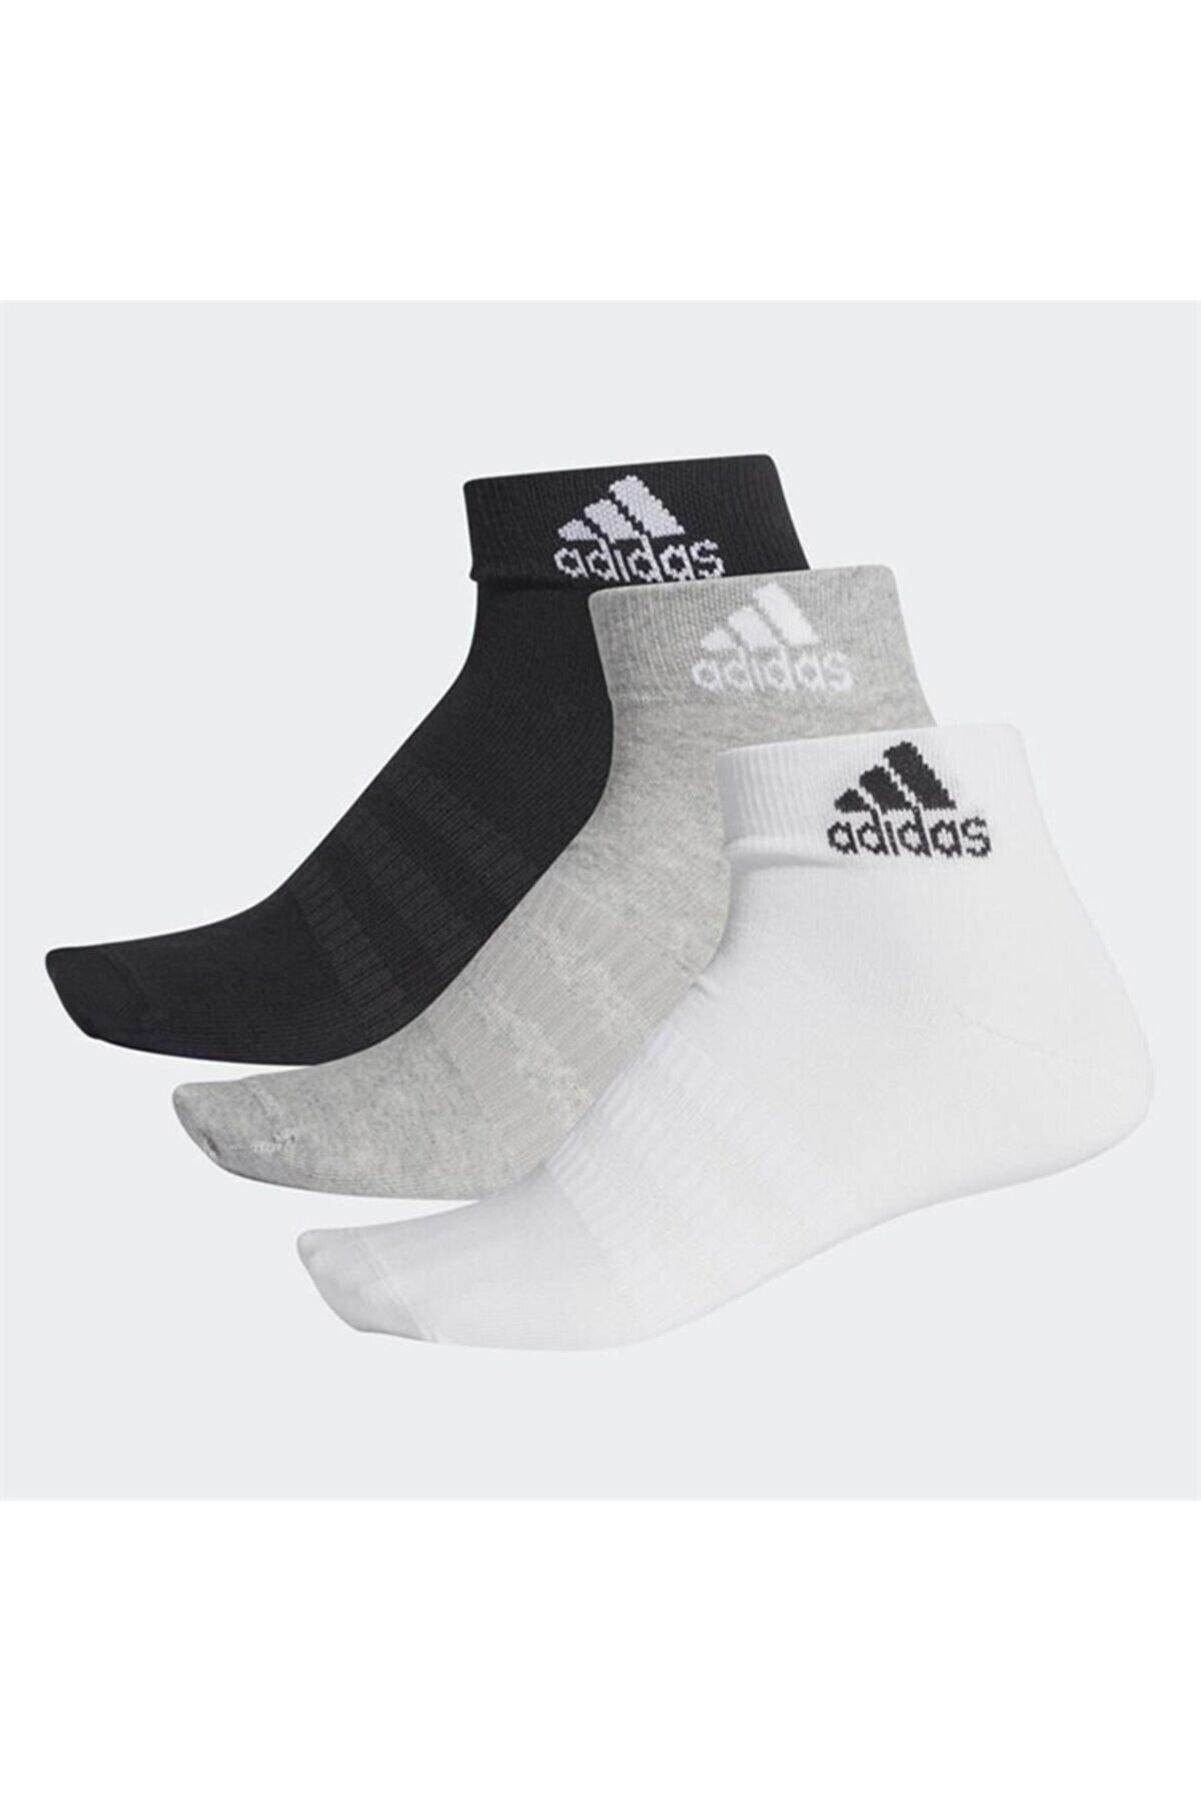 adidas Light Ank 3pp Unisex Günlük Çorap - Dz9434